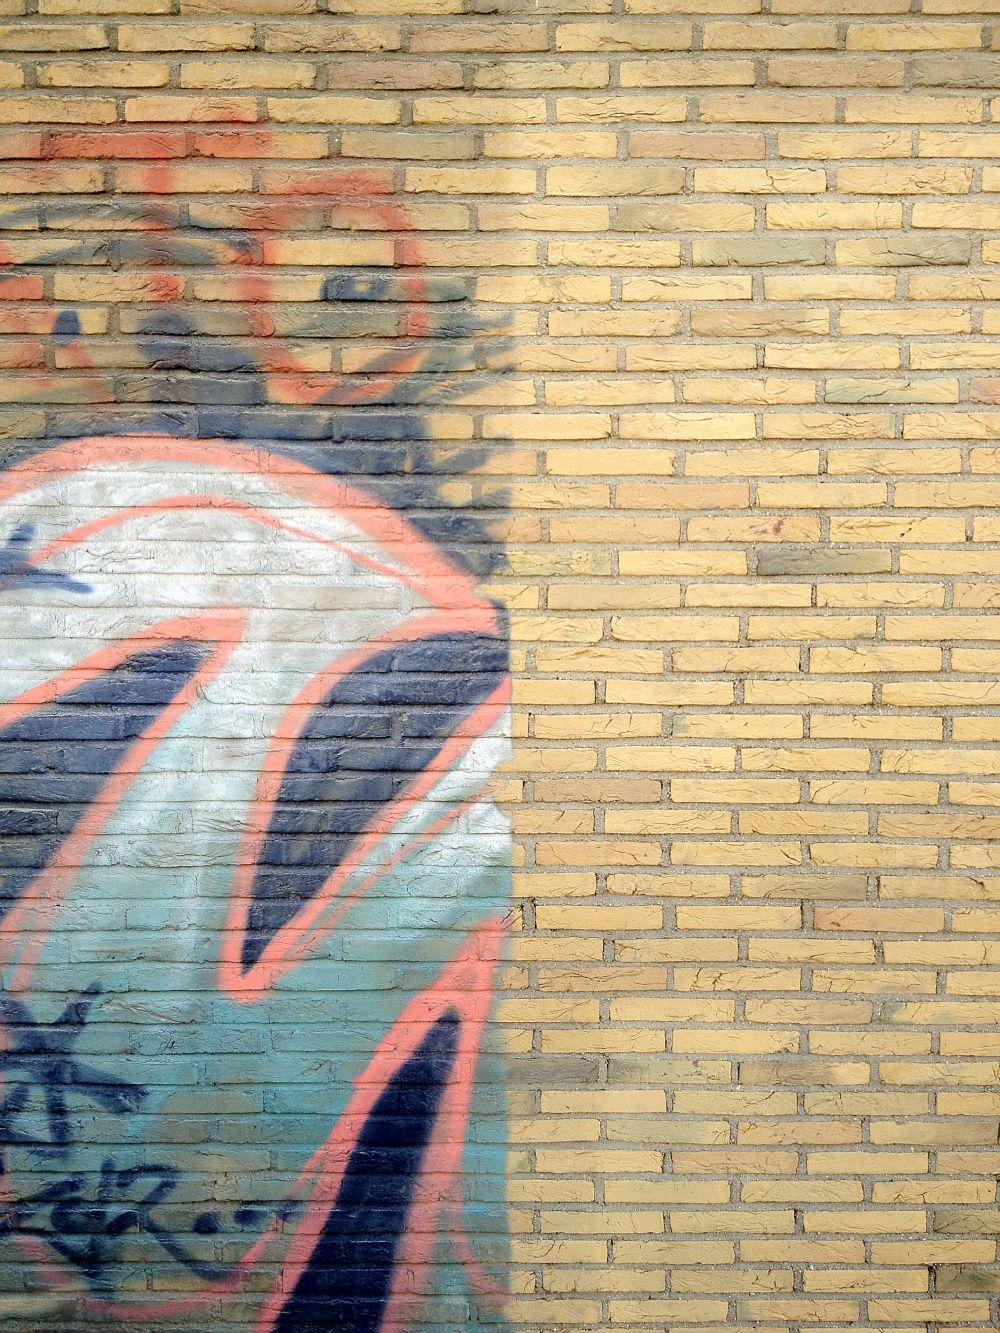 Graffiti-entfernen-51